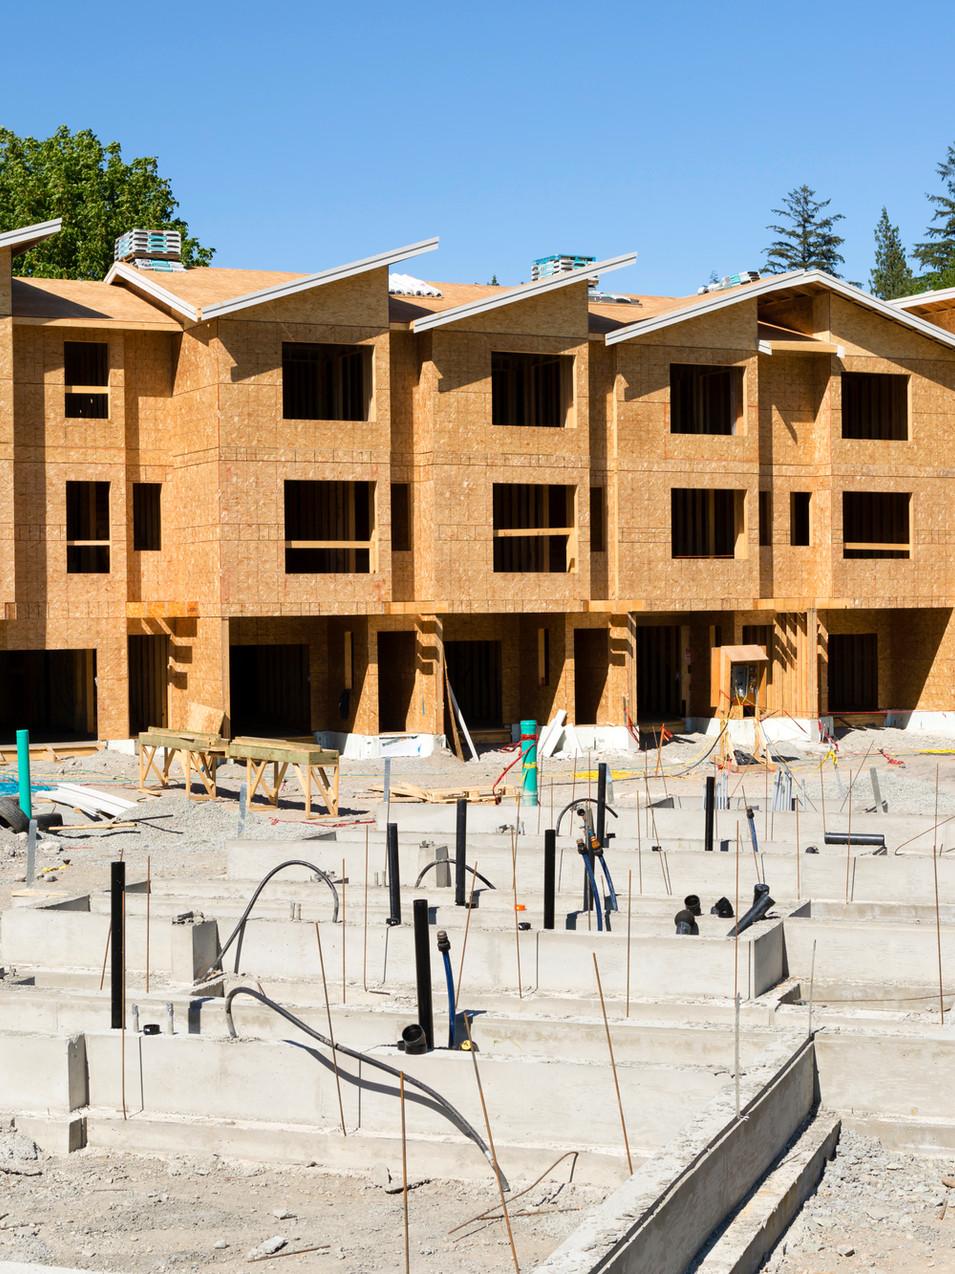 Meeting Housing Needs